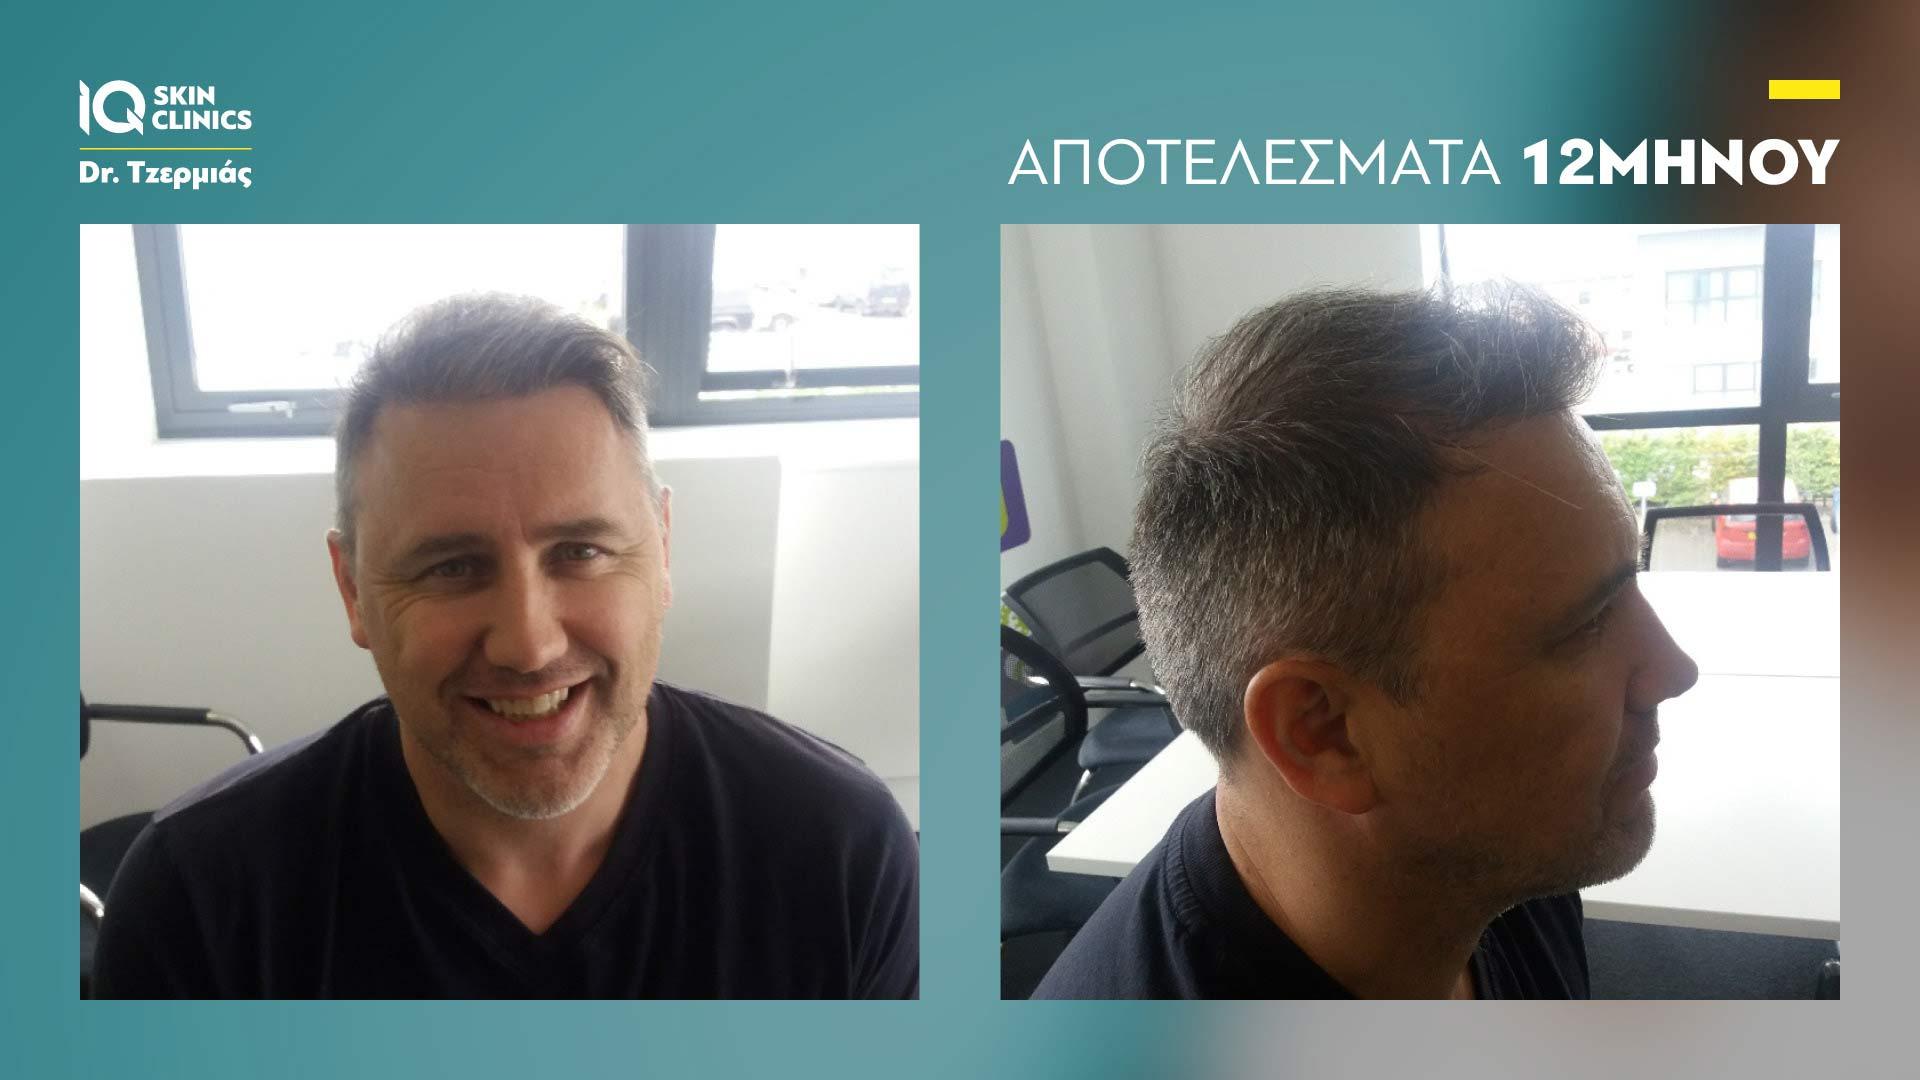 Testimonial: FUE Mεταμόσχευση Mαλλιών | H εμπειρία του Jason Gow